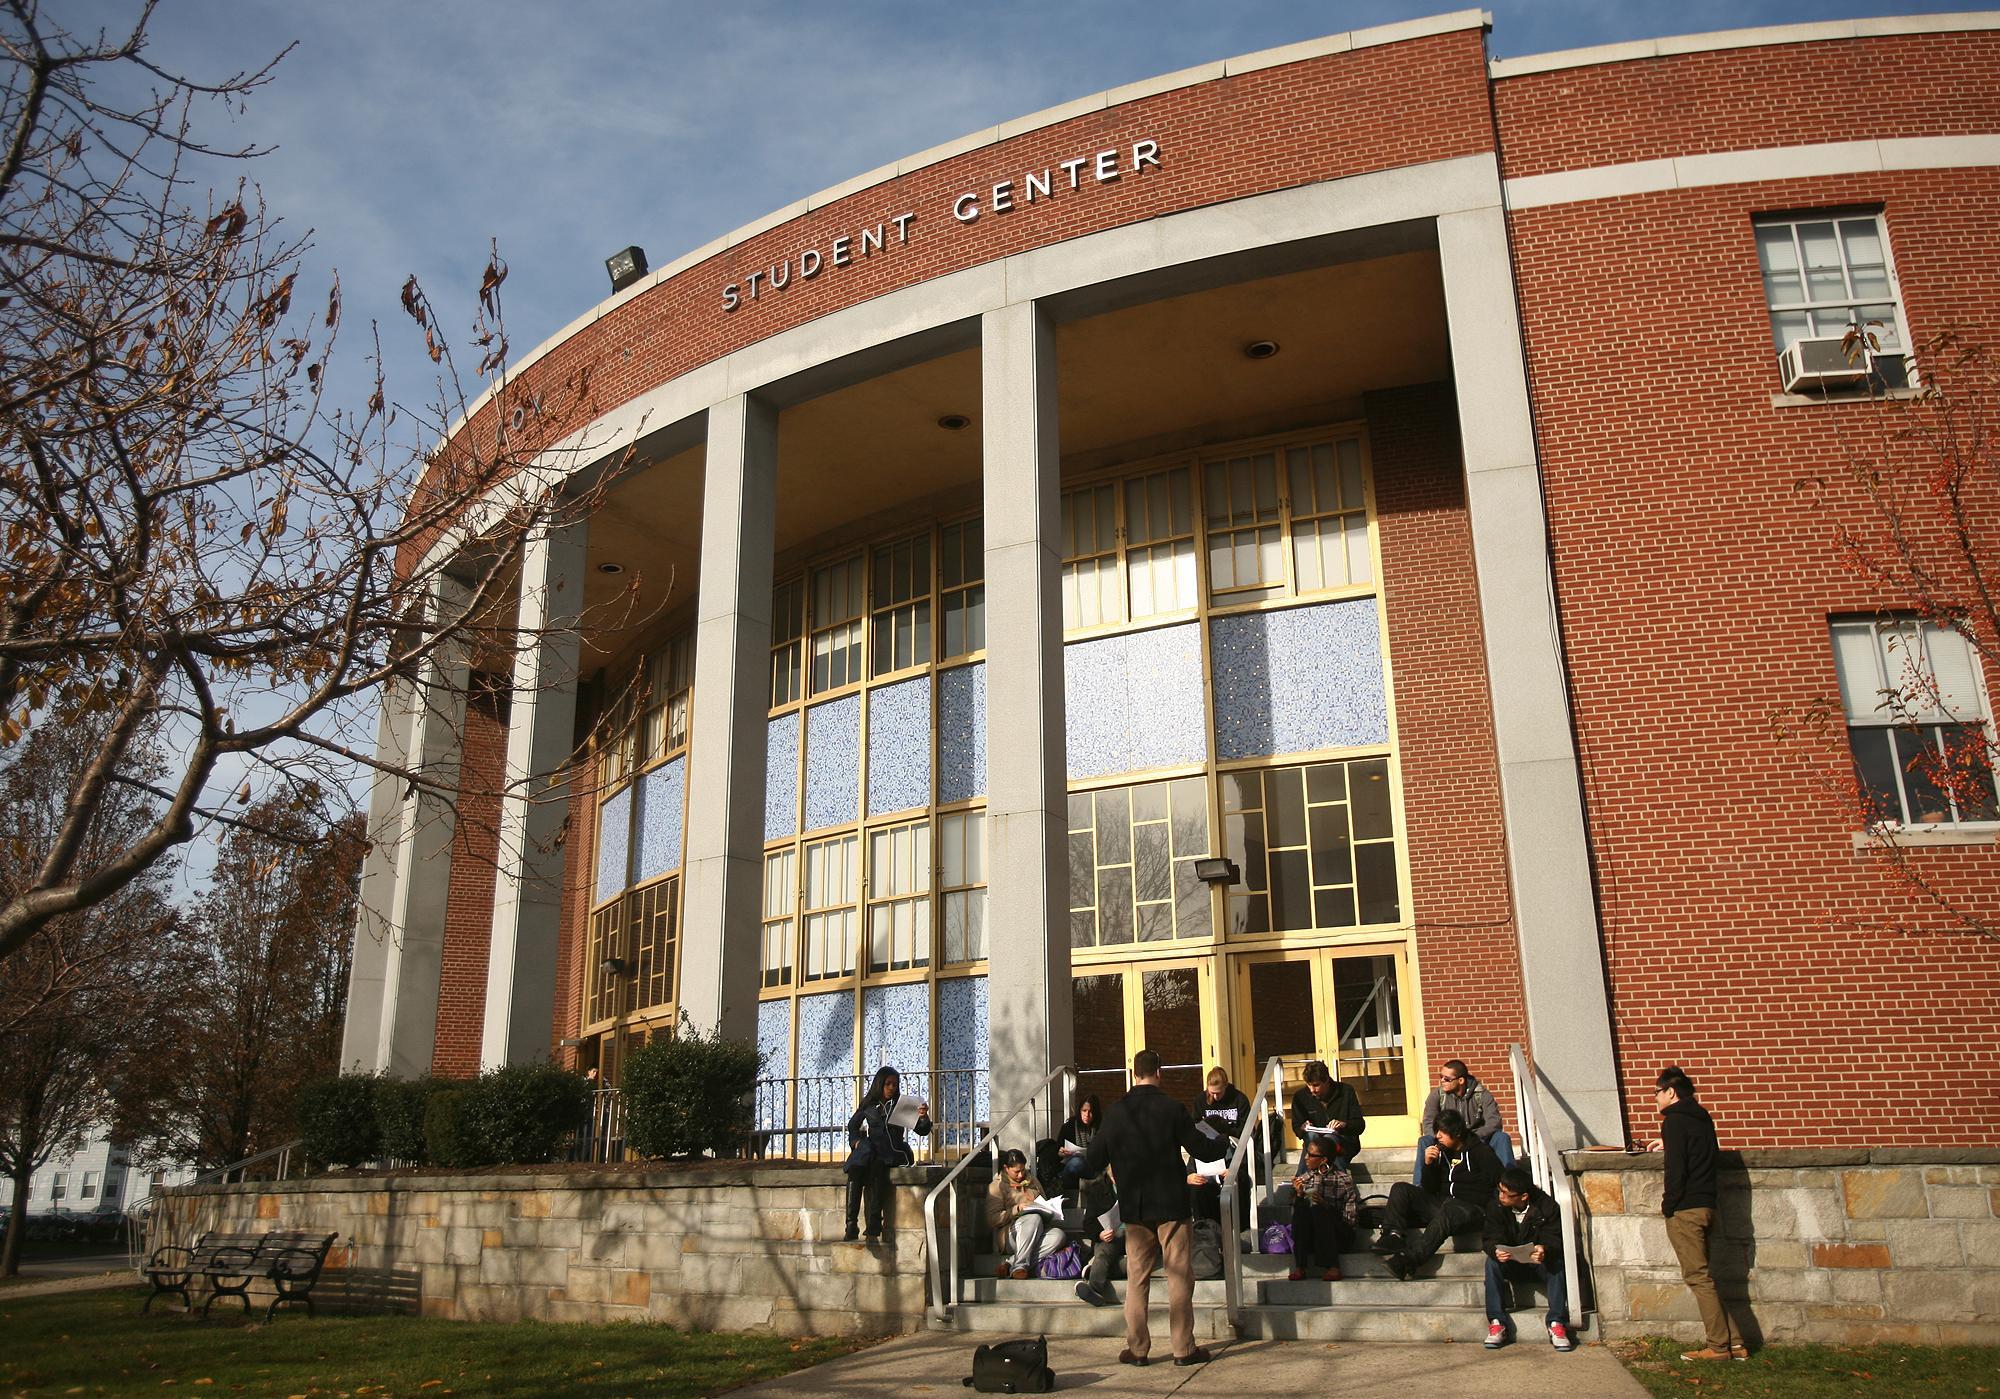 University Of Bridgeport Tuition >> University of Bridgeport extends in-state tuition break ...